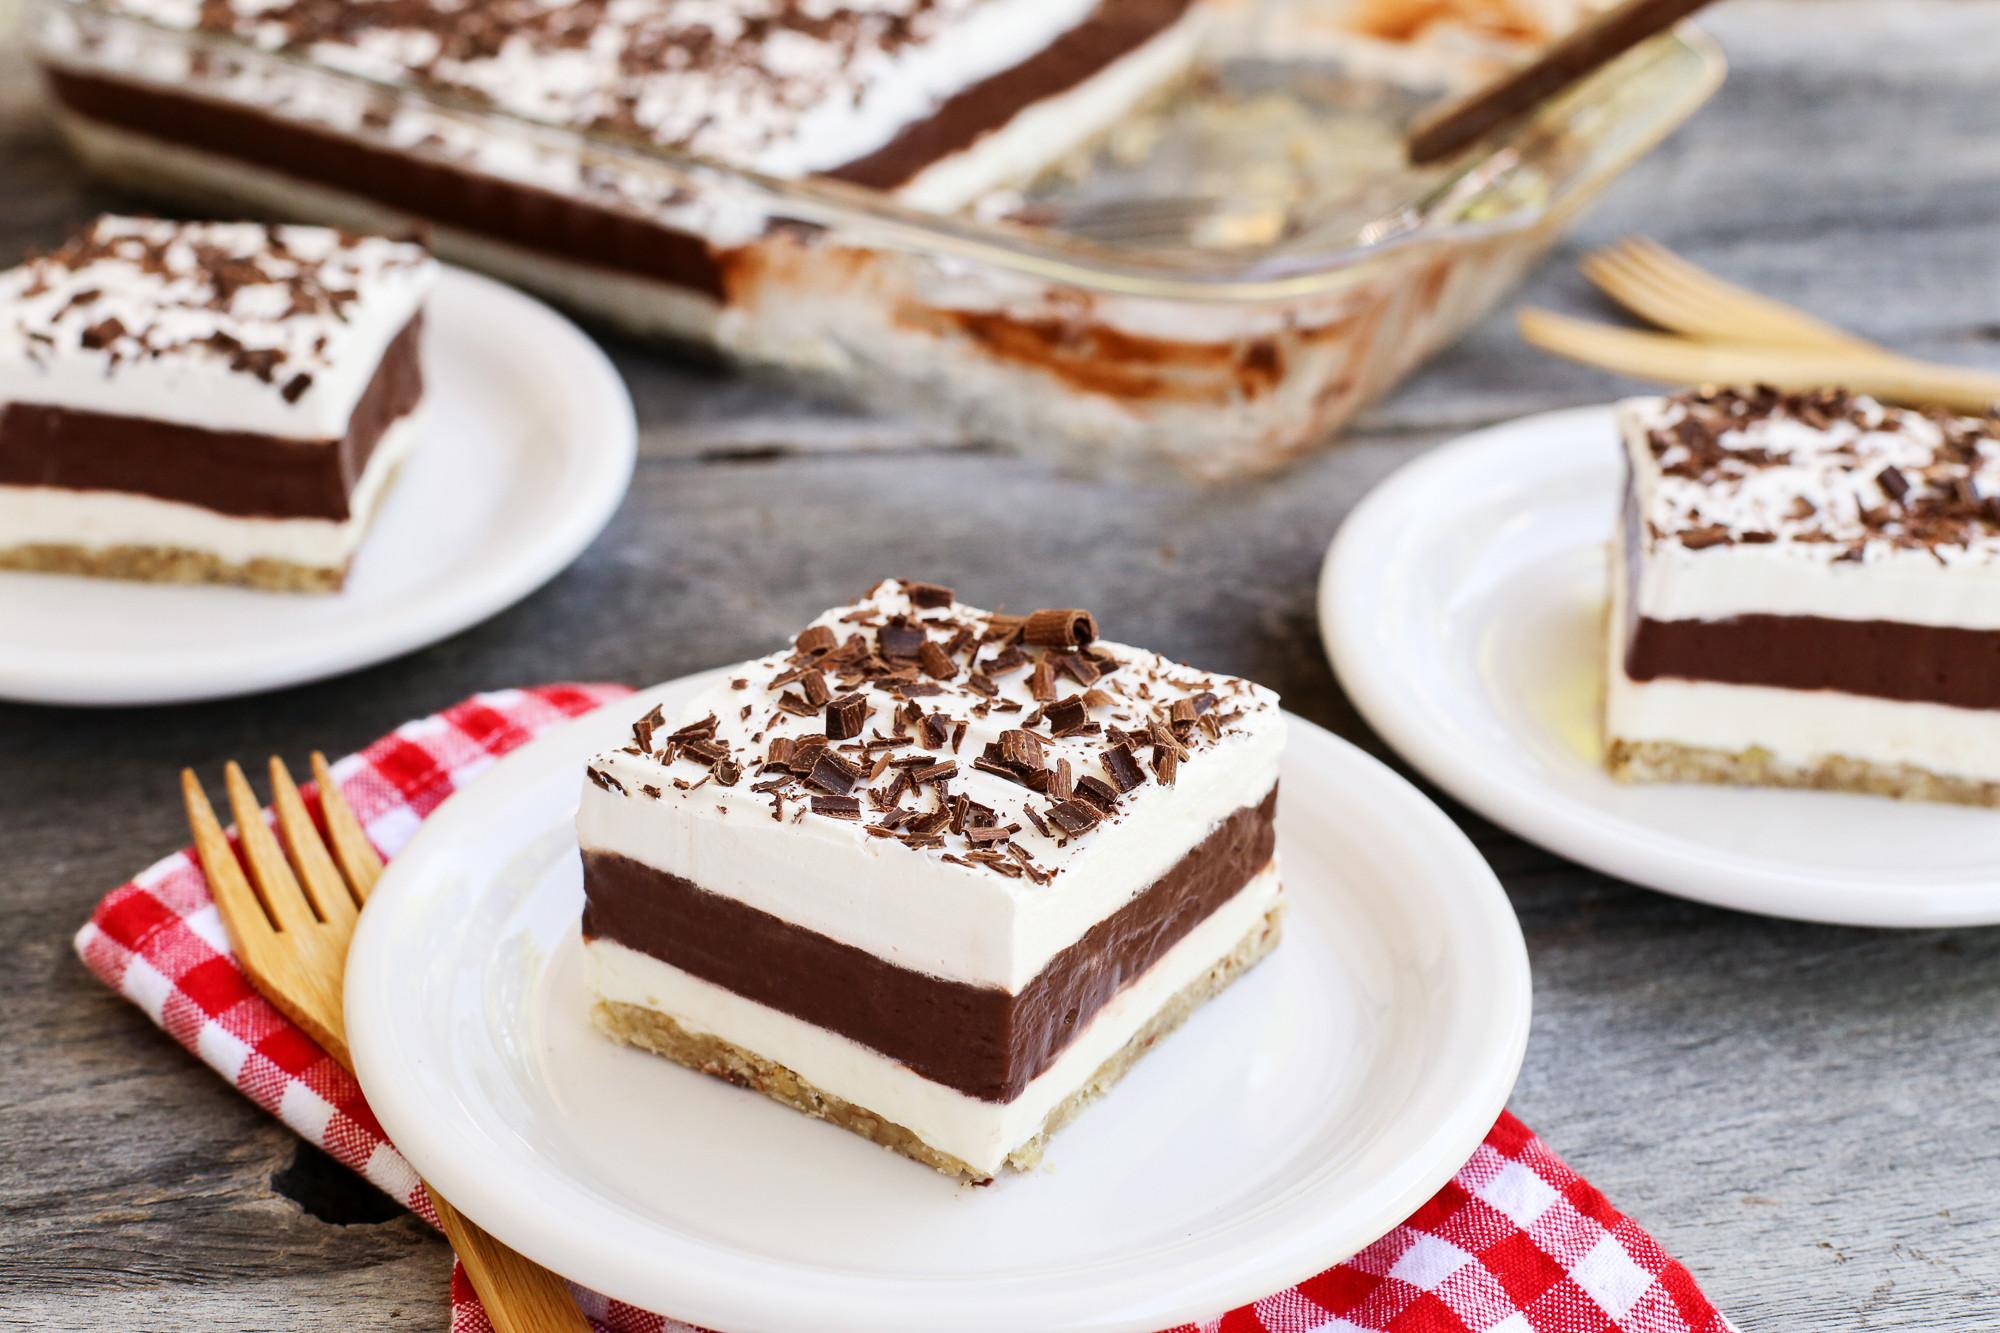 Chocolate Desserts Easy  Layered Chocolate Pudding Dessert